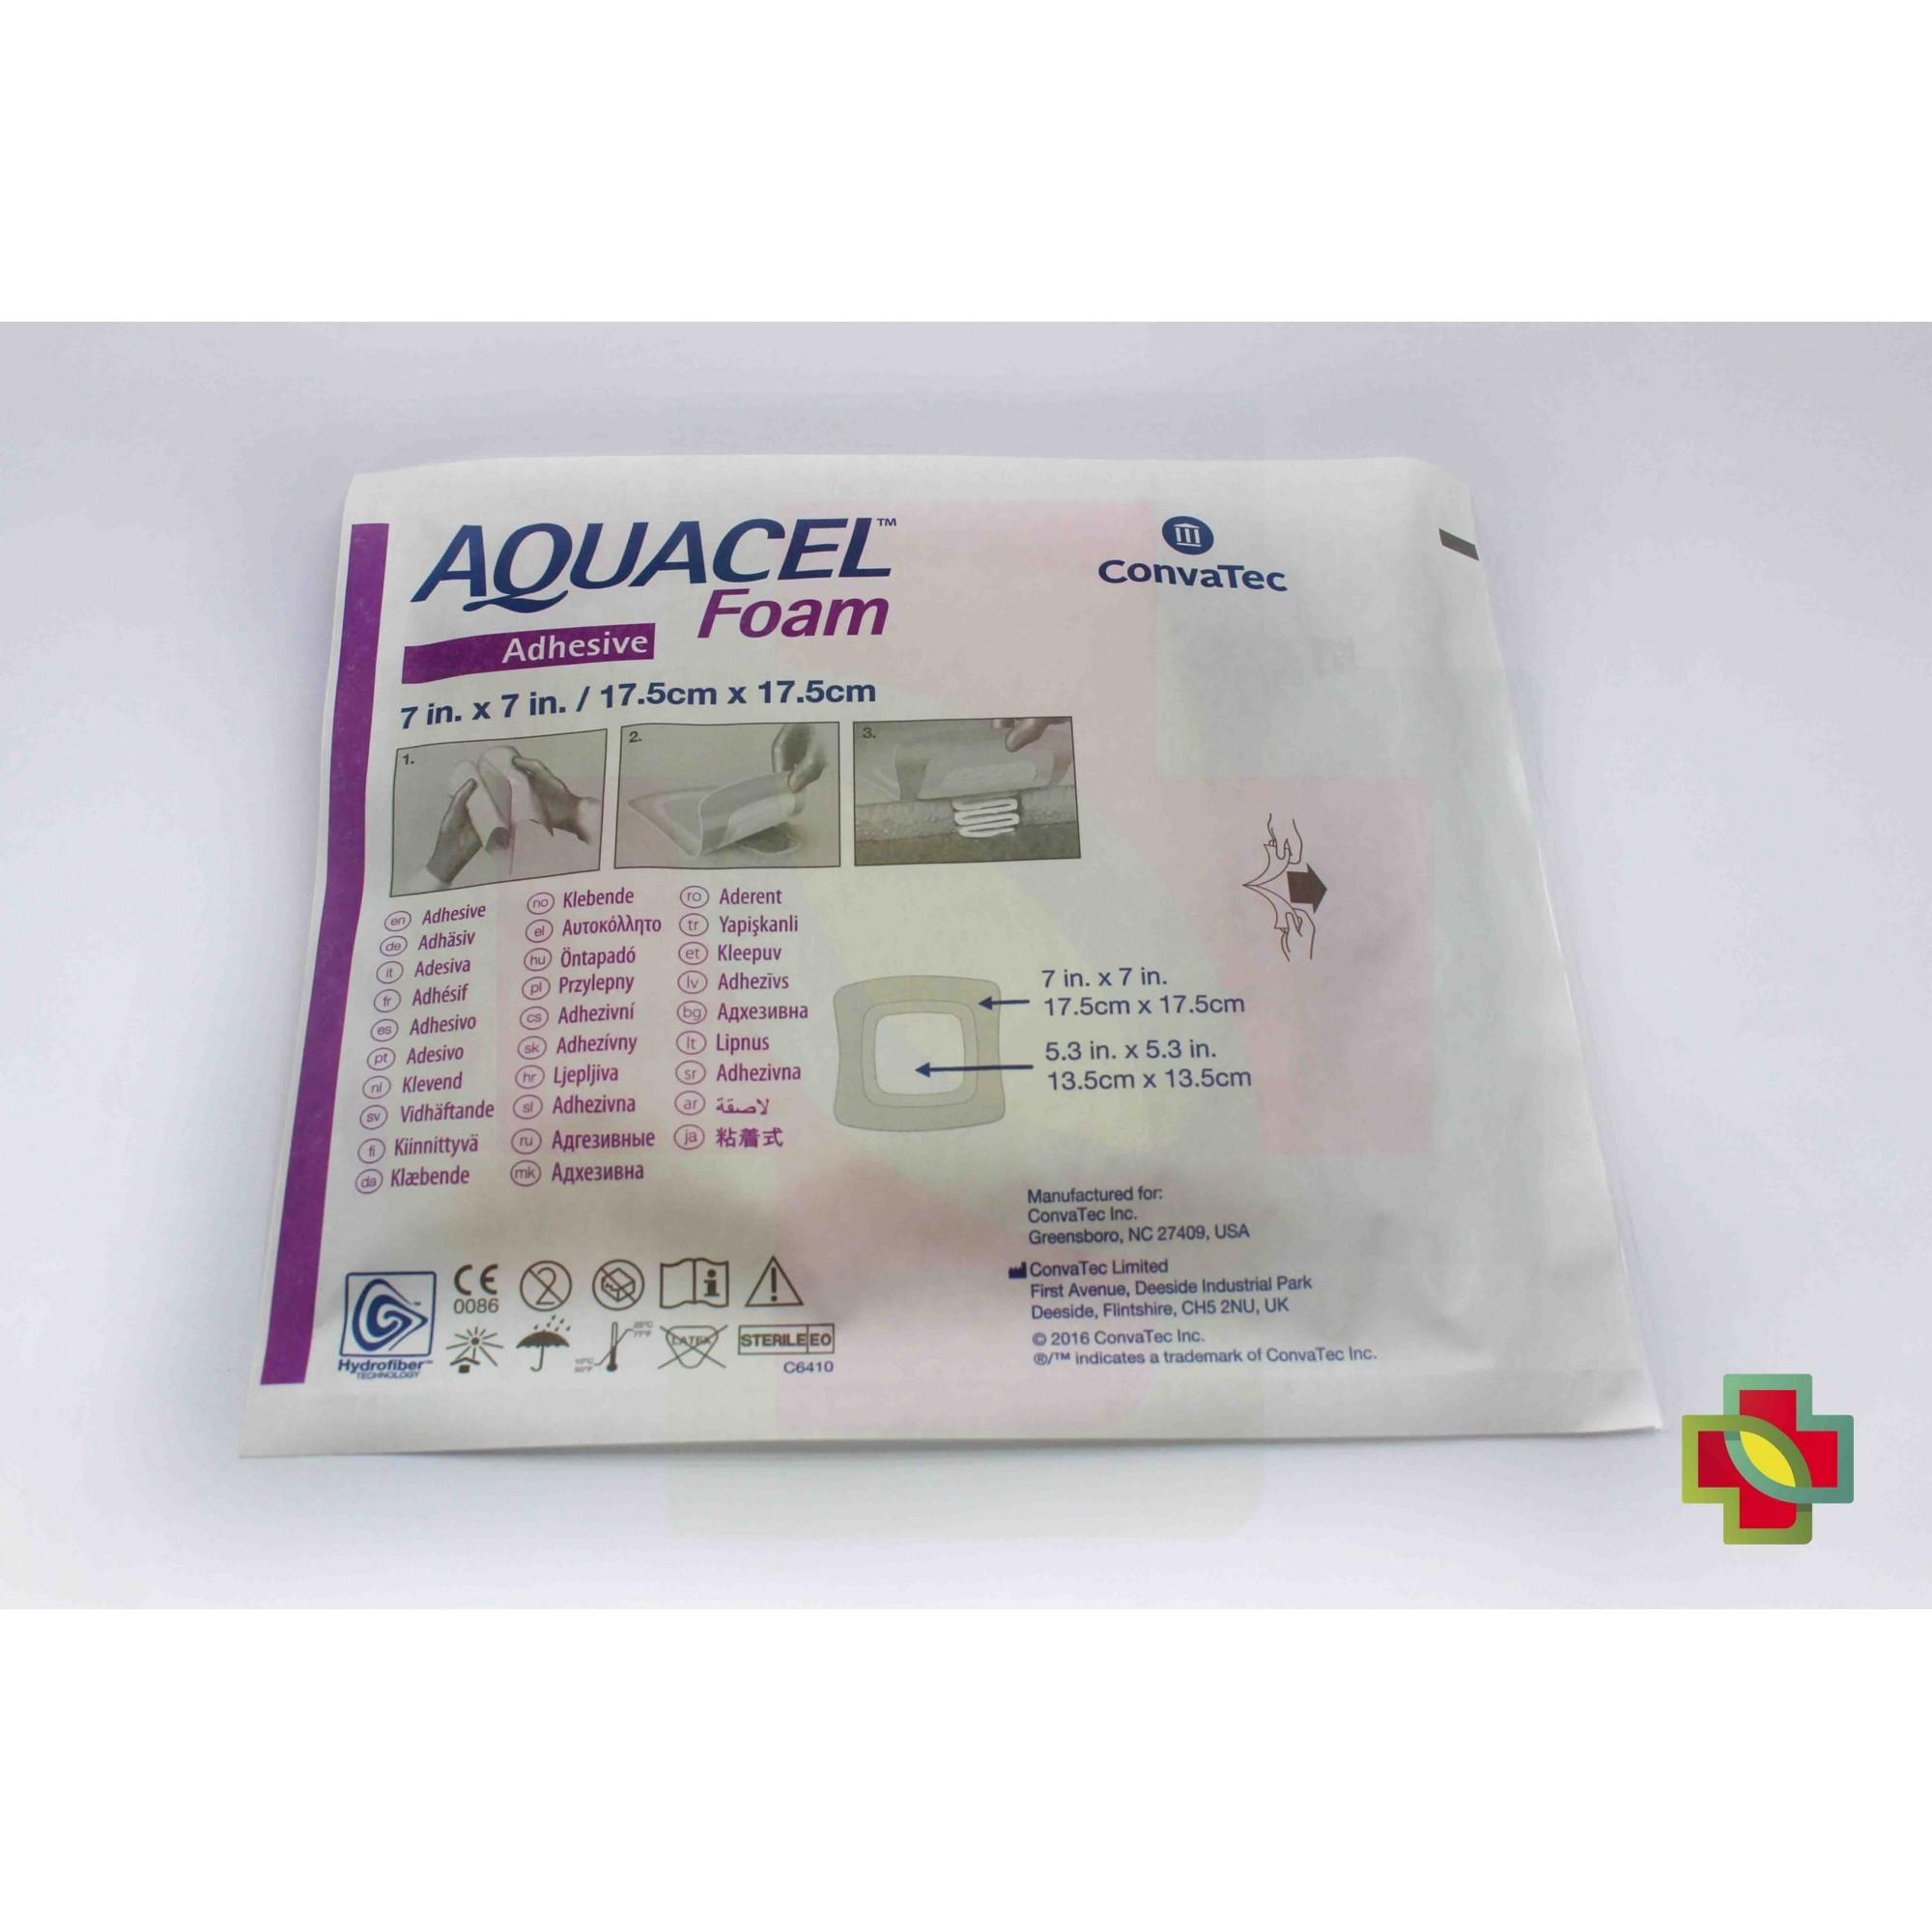 CURATIVO AQUACEL FOAM 17,5 X 17,5 CM S/ ADESIVO UND. 420621 - CONVATEC